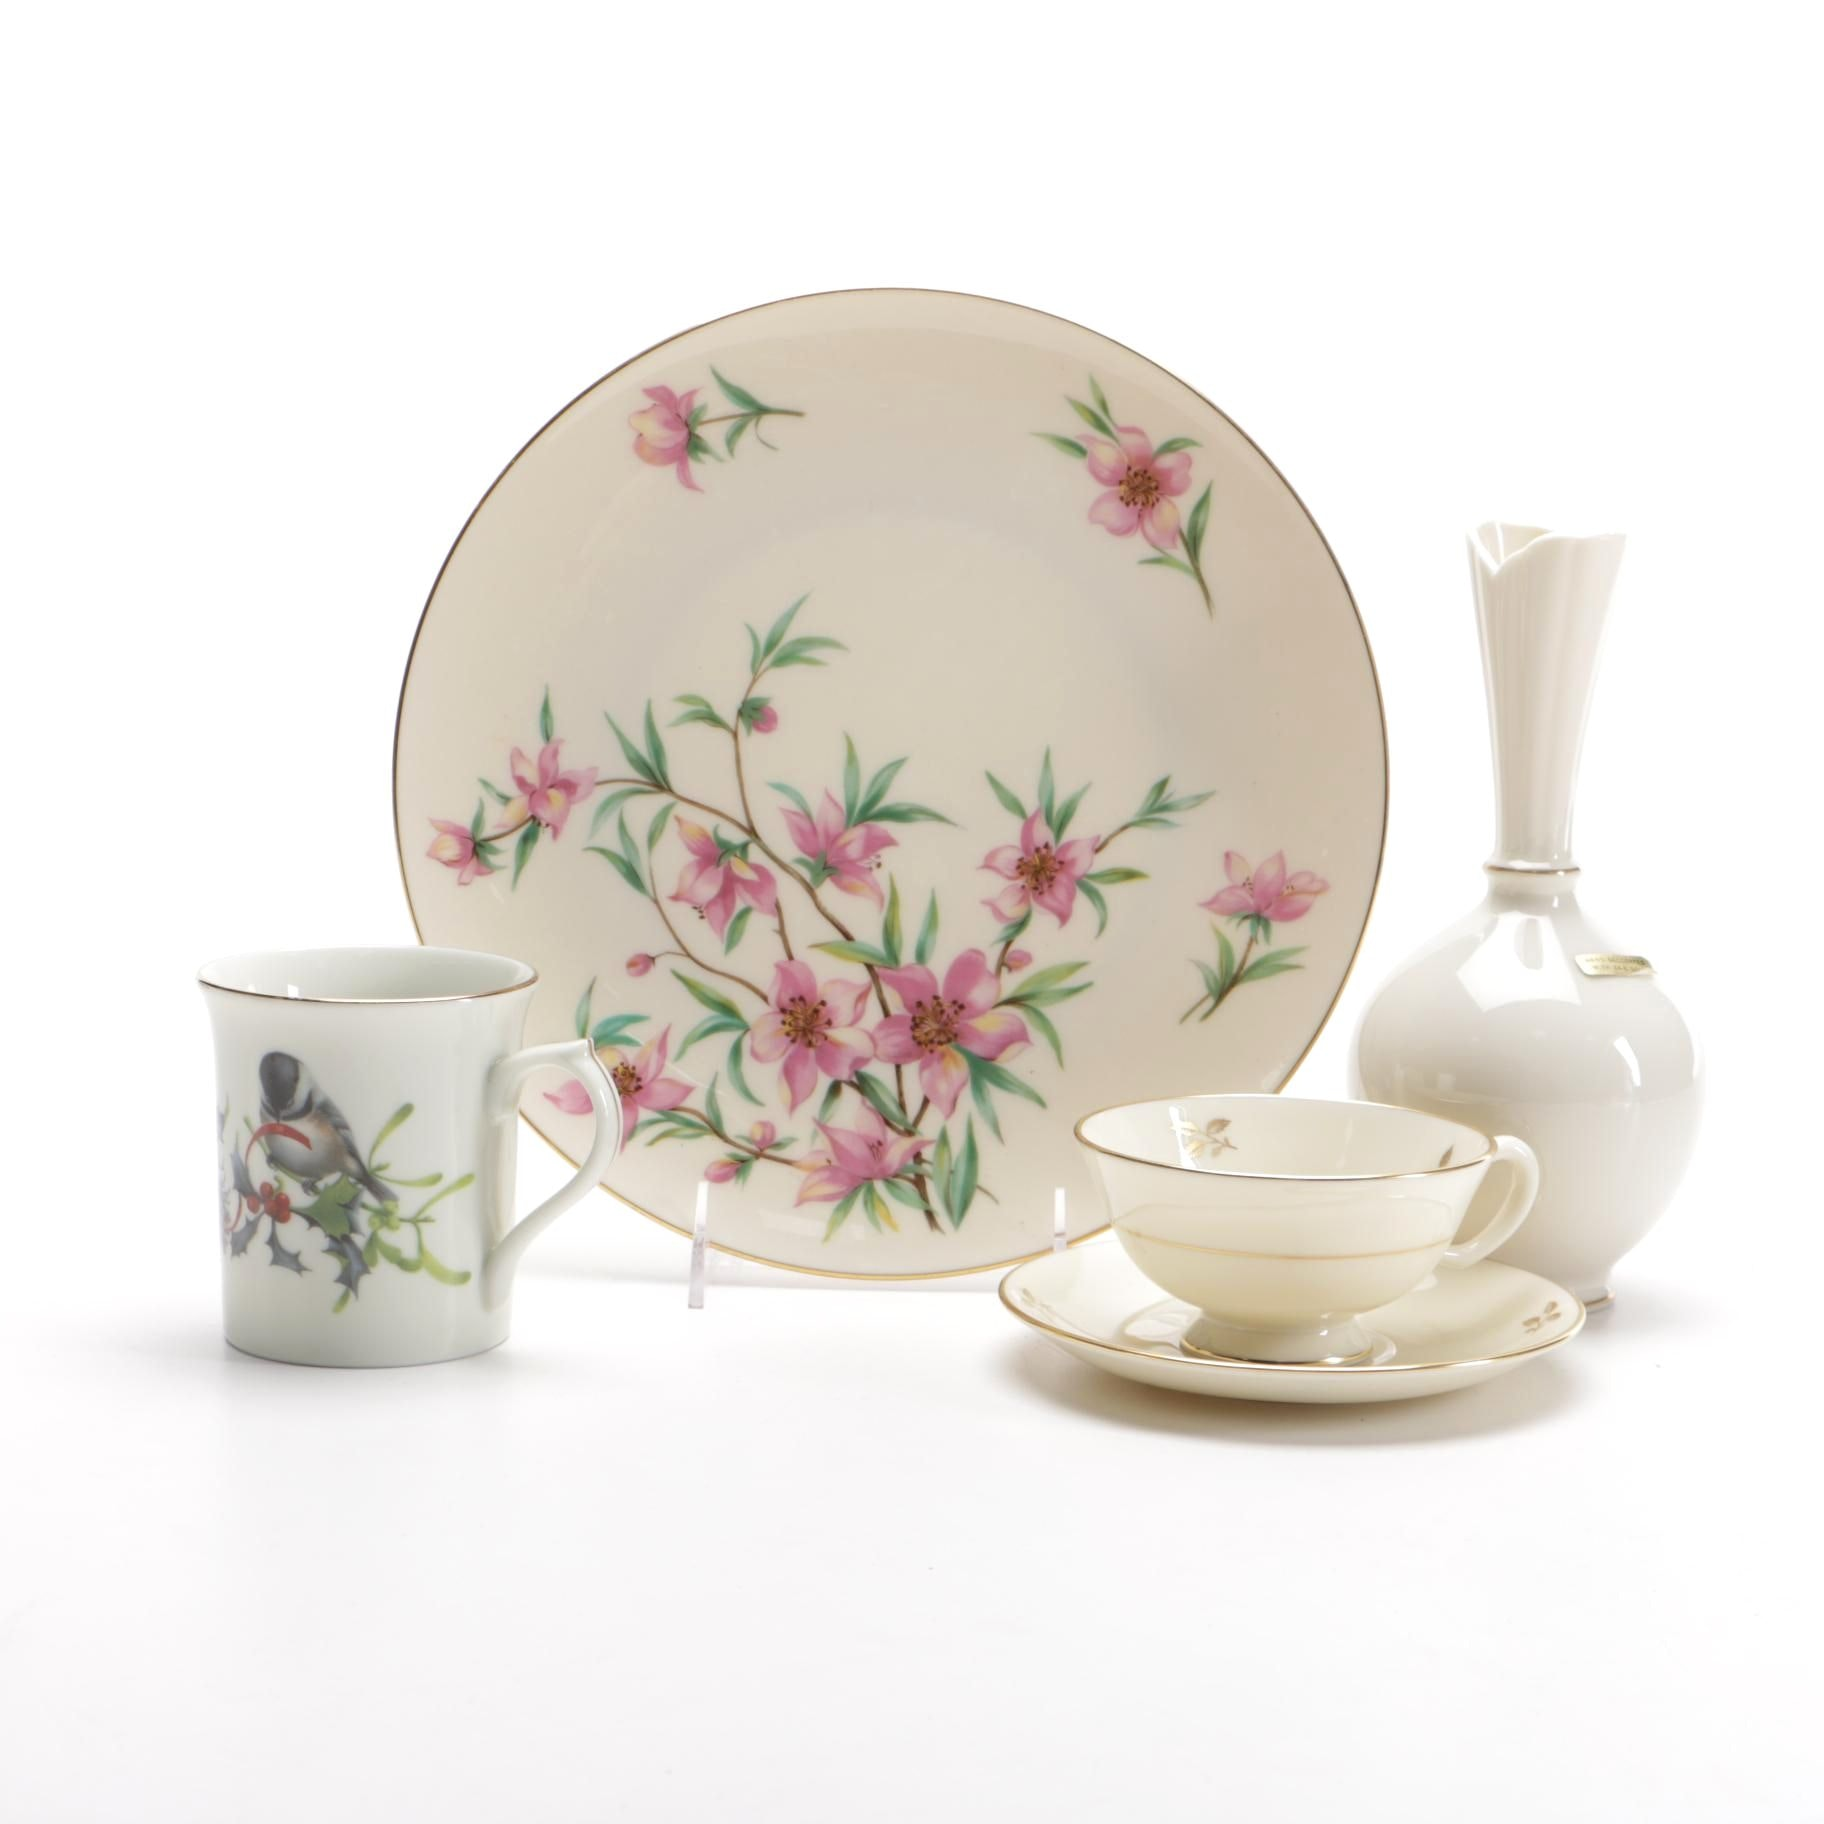 Assorted Lenox China Tableware